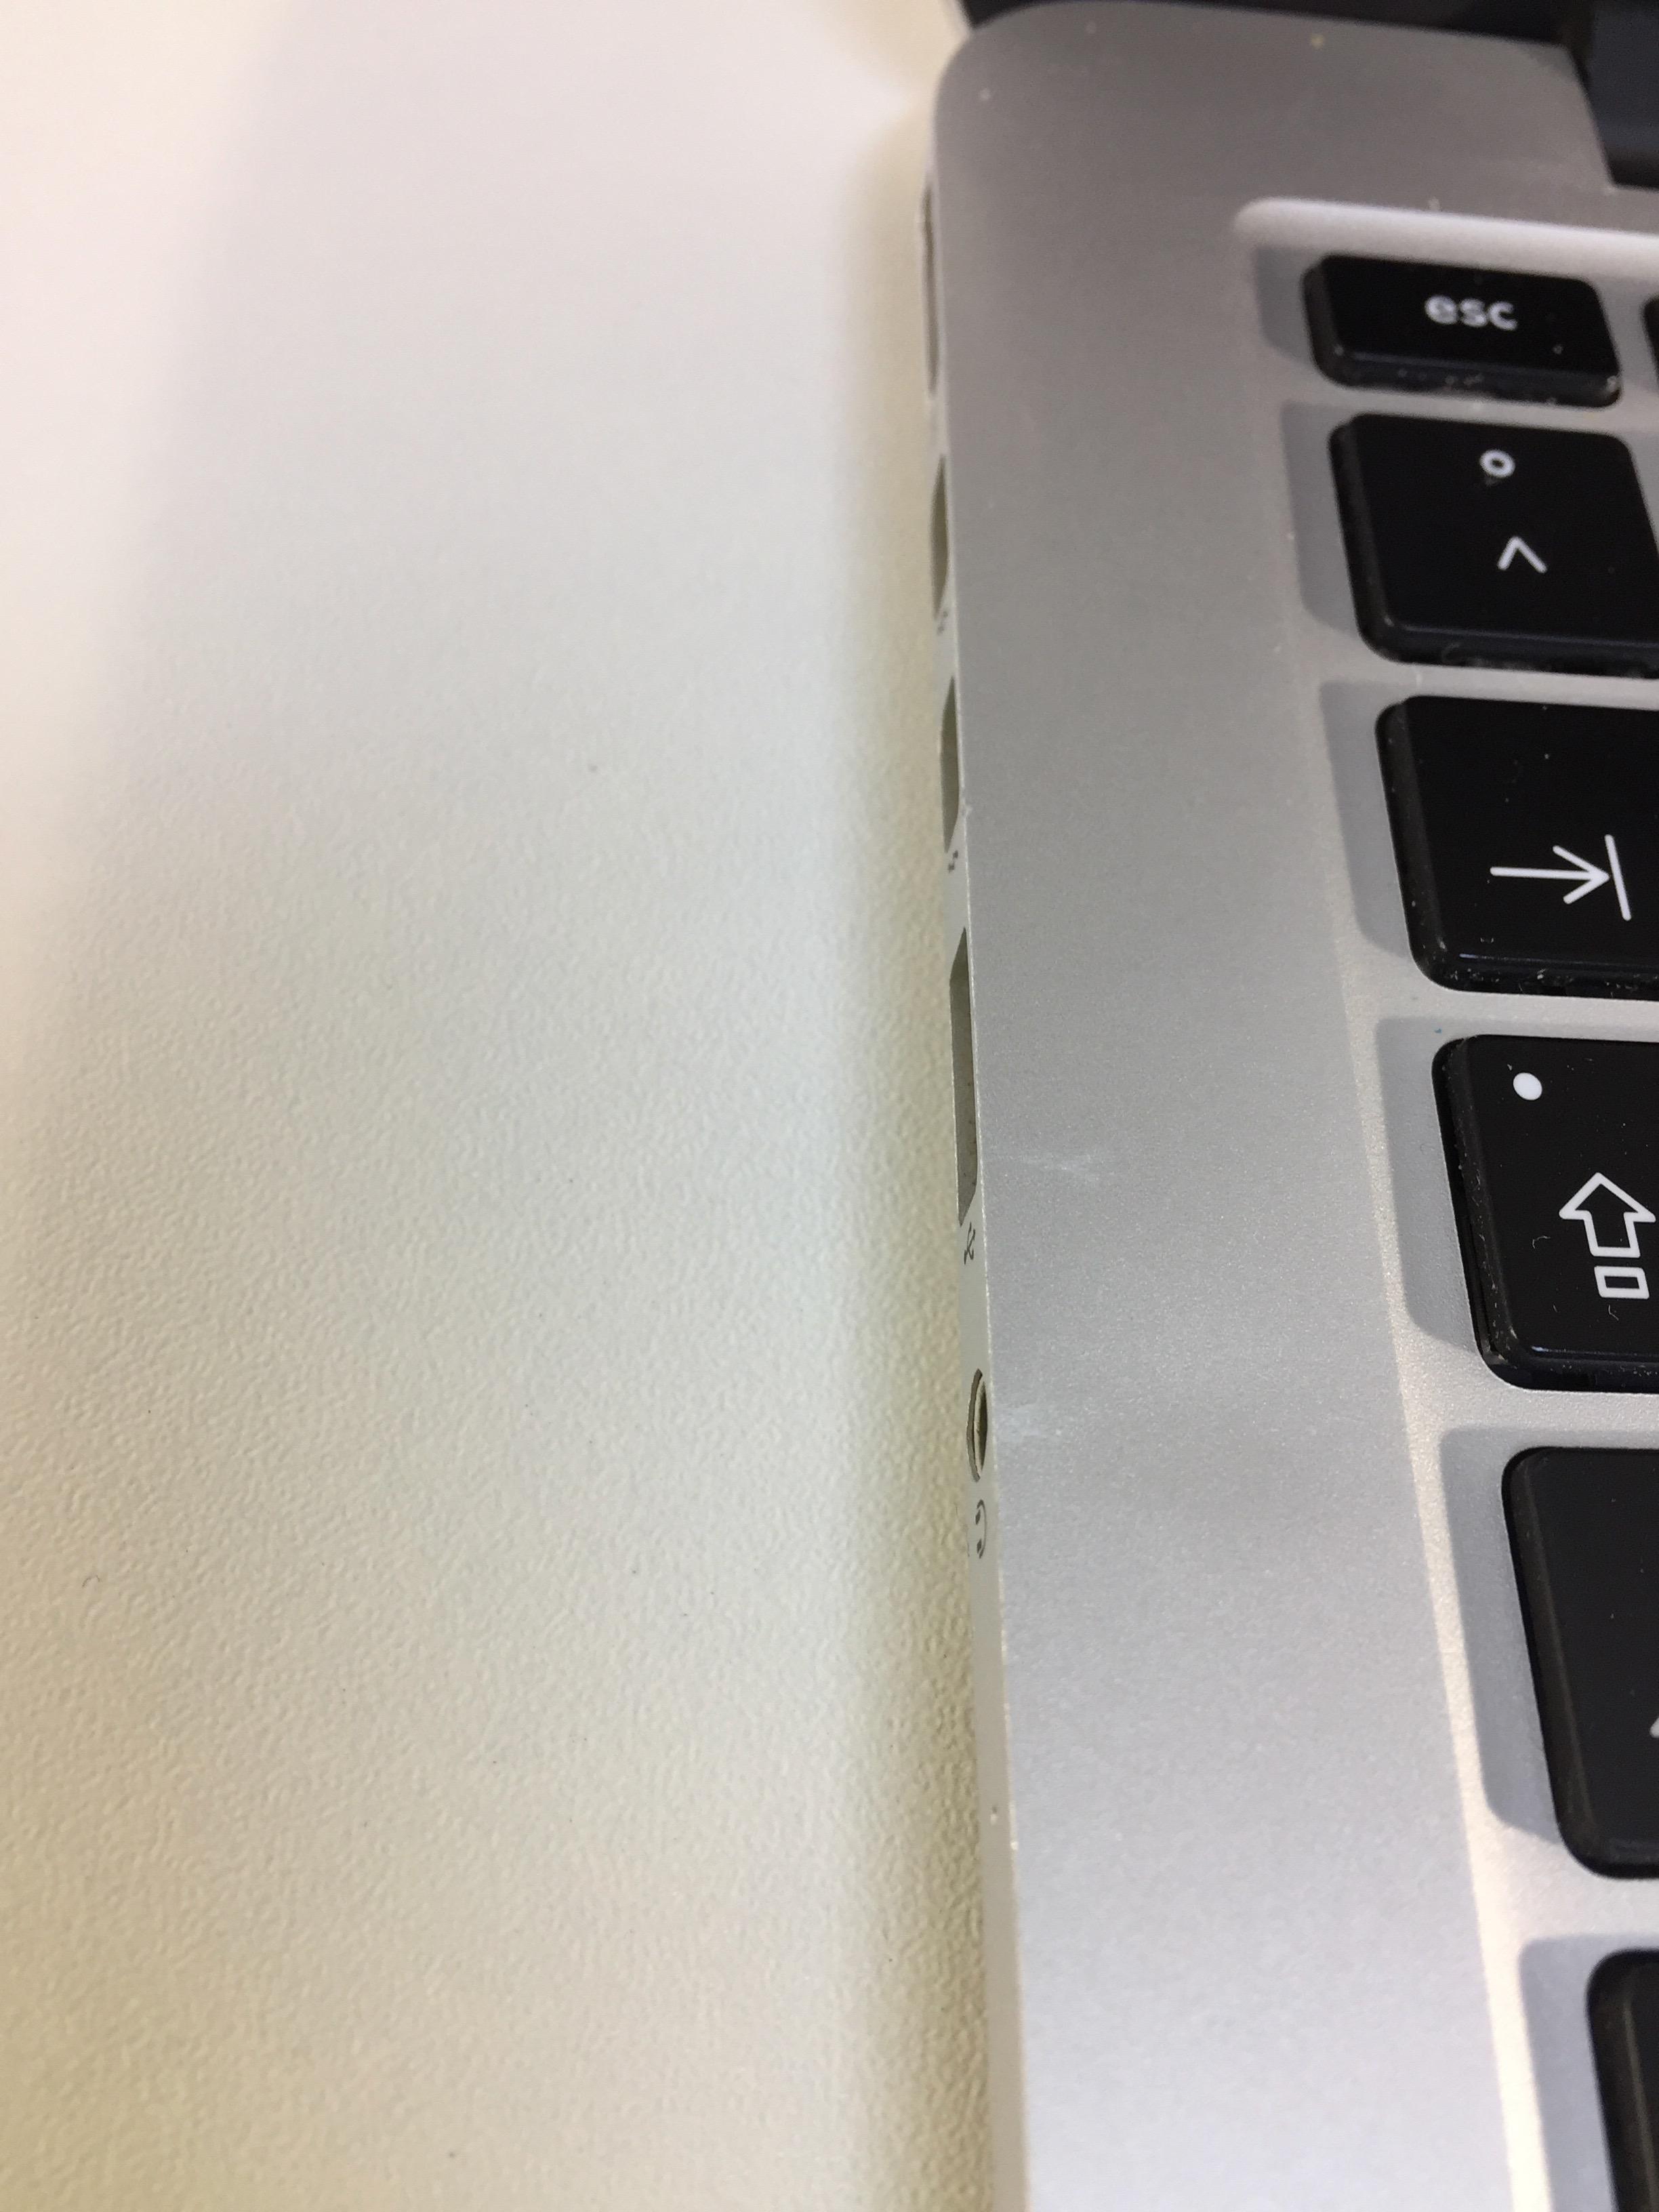 MacBook Pro 13-inch Retina, 2.6 GHz Intel Core i5, 16 GB , 128 GB Flash, Bild 4